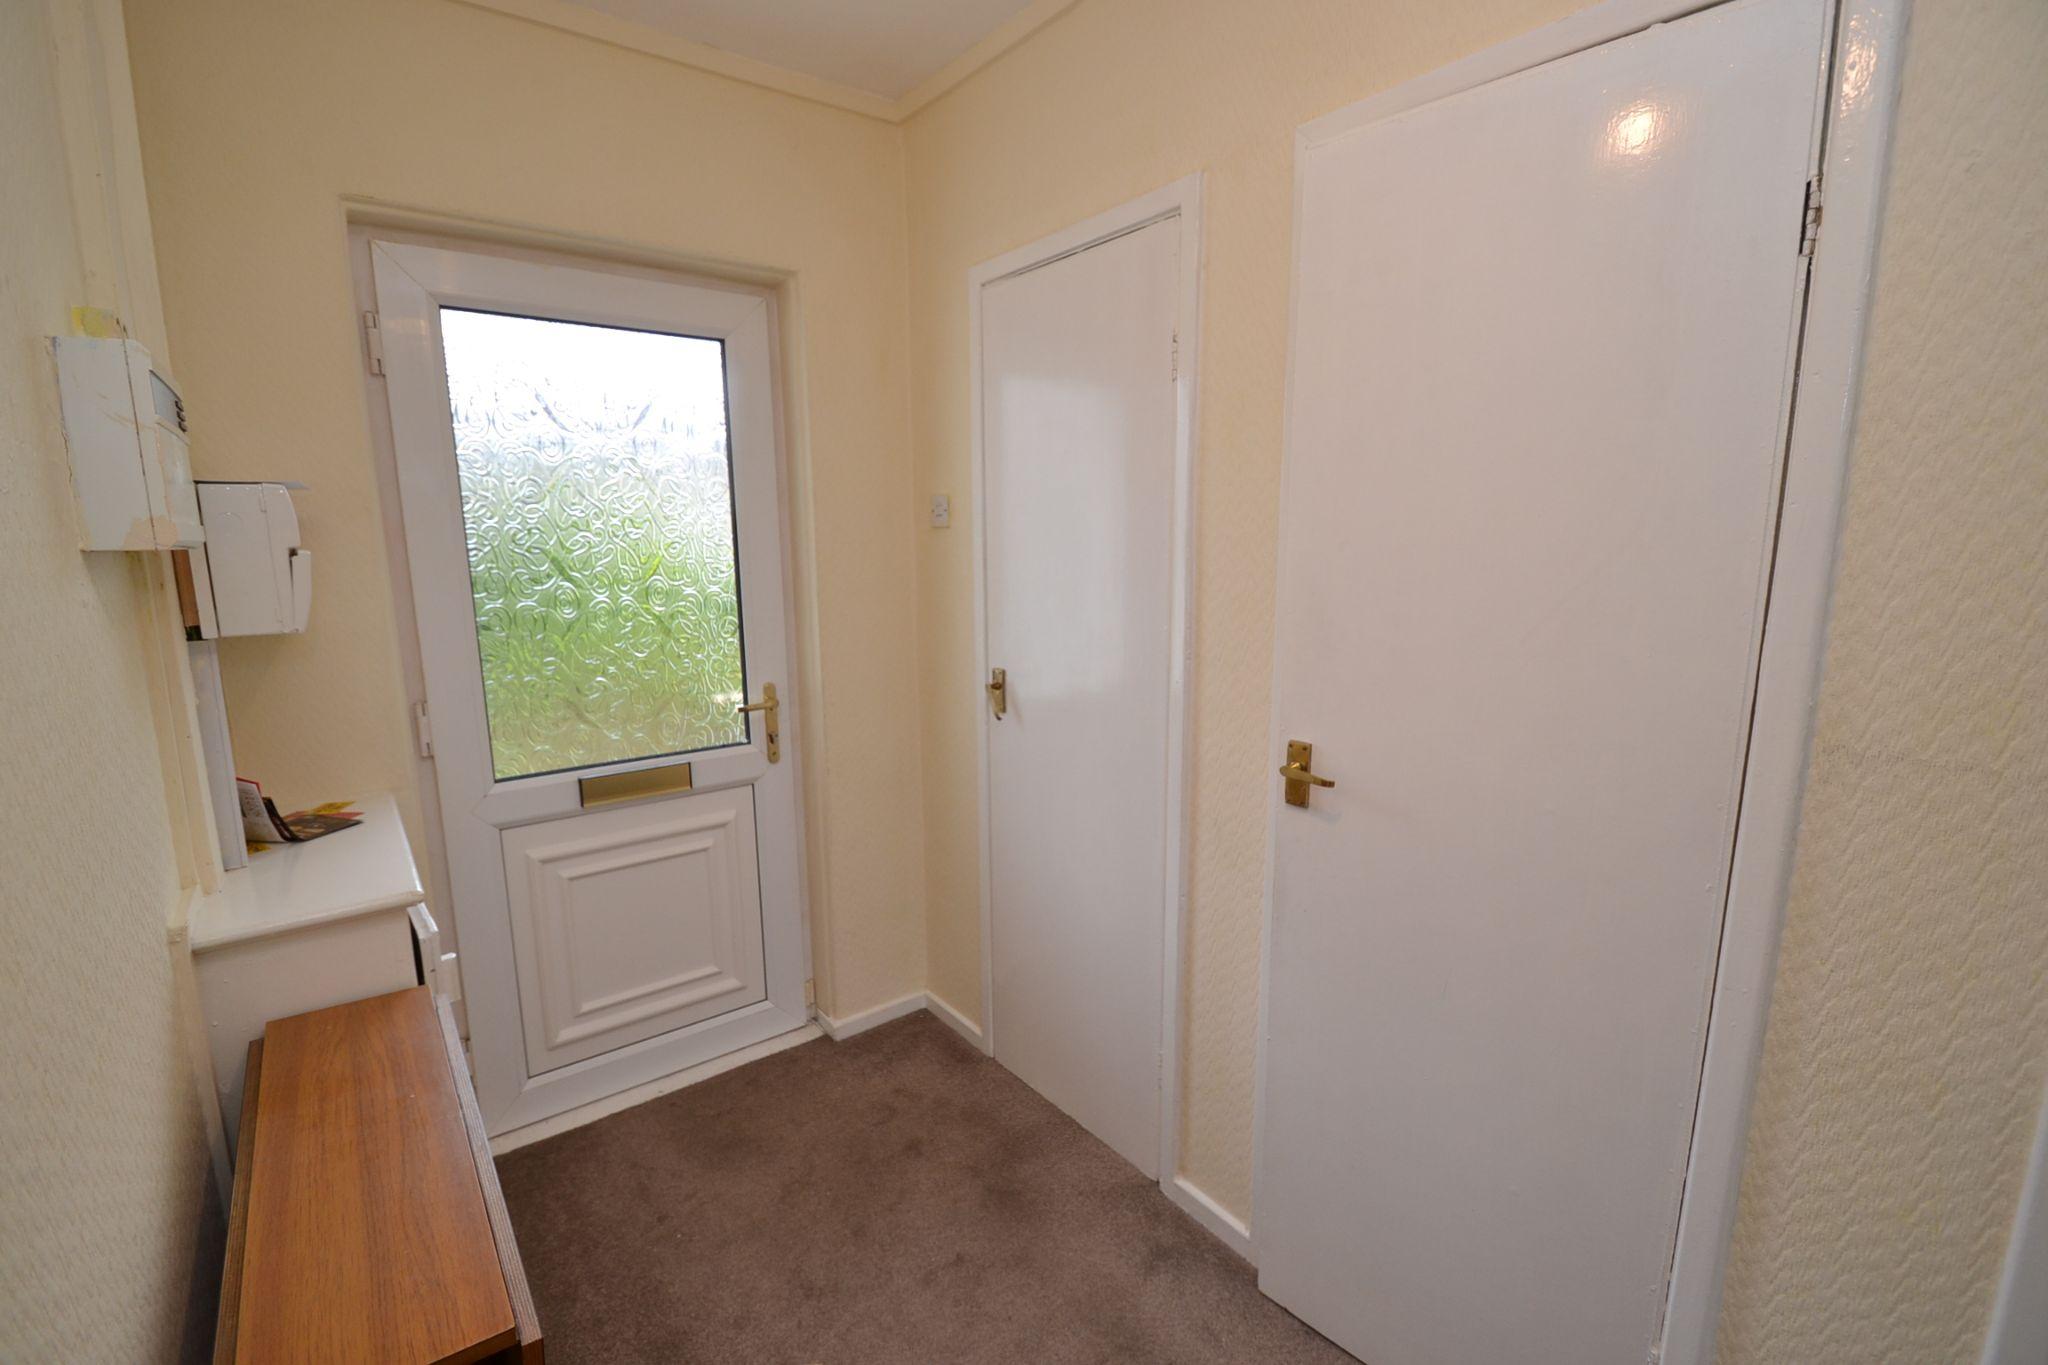 1 Bedroom Ground Floor Maisonette Flat/apartment For Sale - Photograph 6